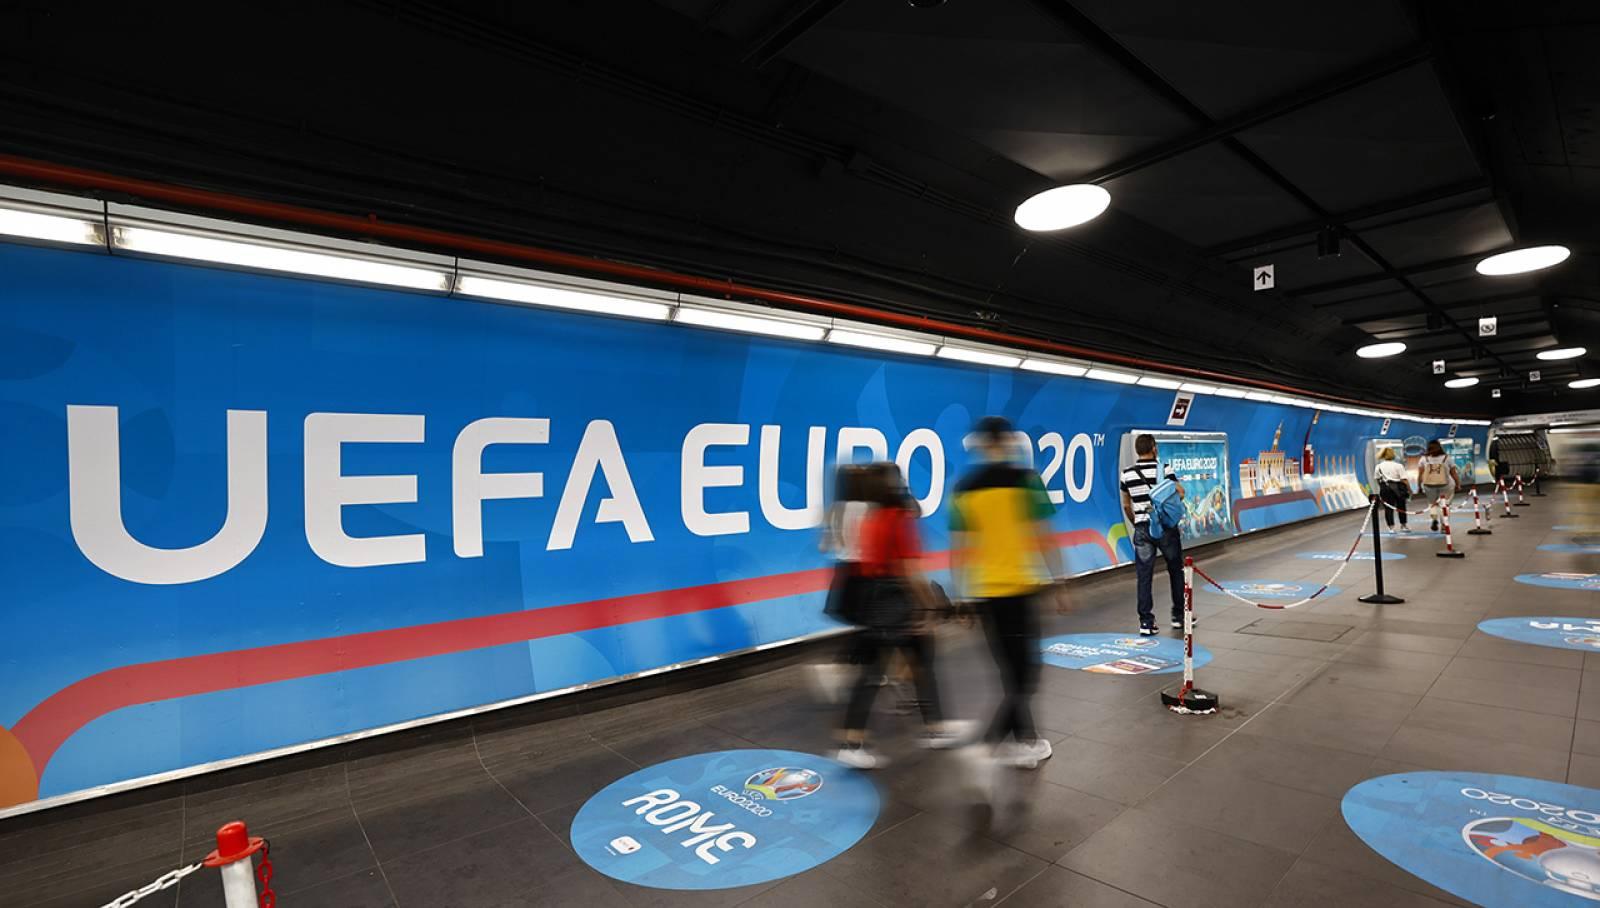 Pubblicità in metropolitana a Roma Spagna Station Domination per UEFA 2020 IGPDecaux